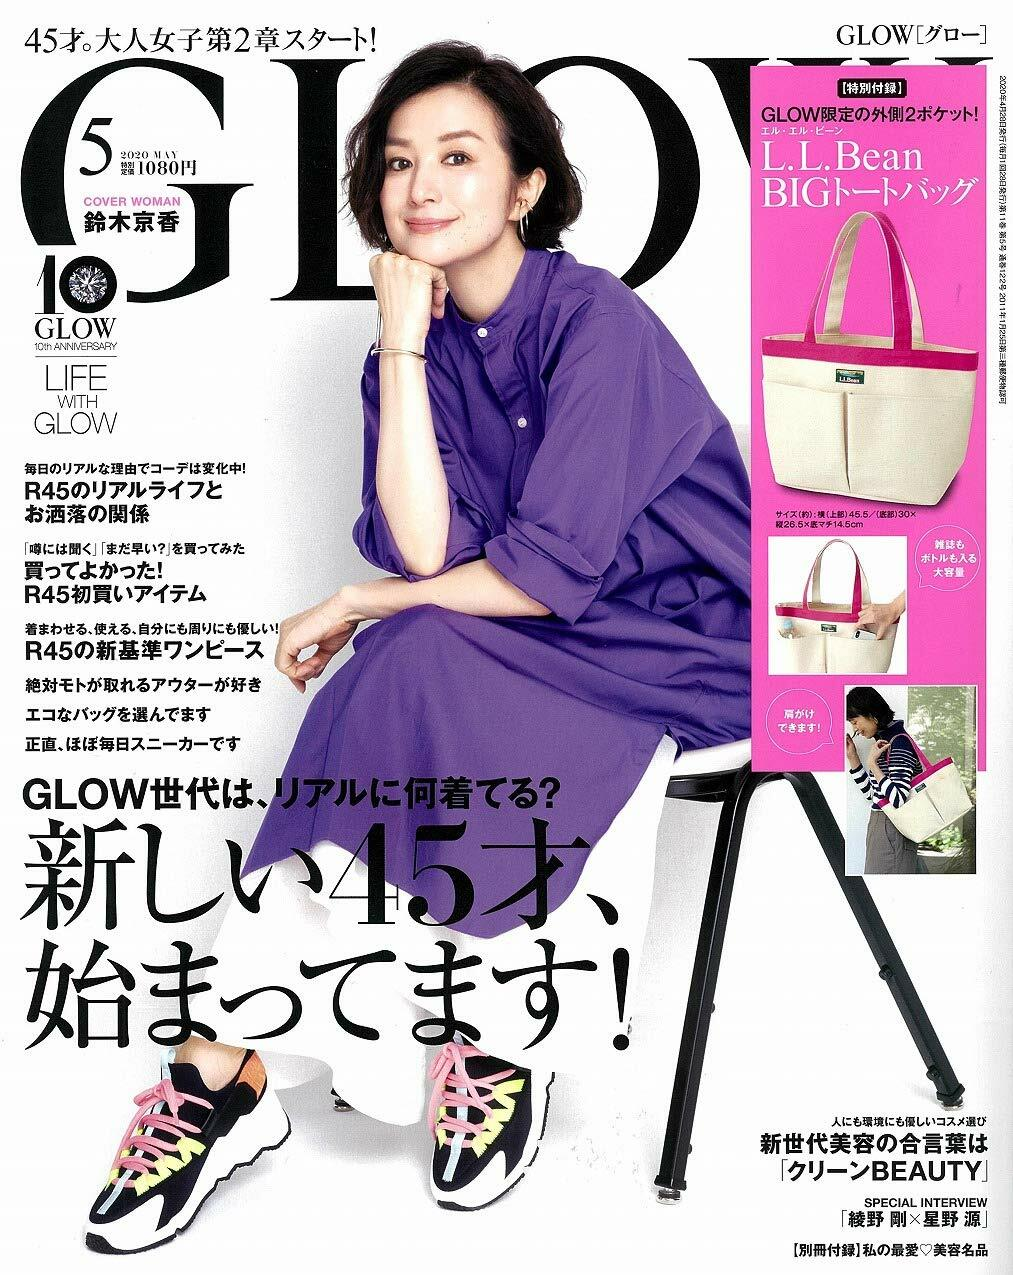 GLOW (グロウ) 2020年 05月號 (雜誌, 月刊)